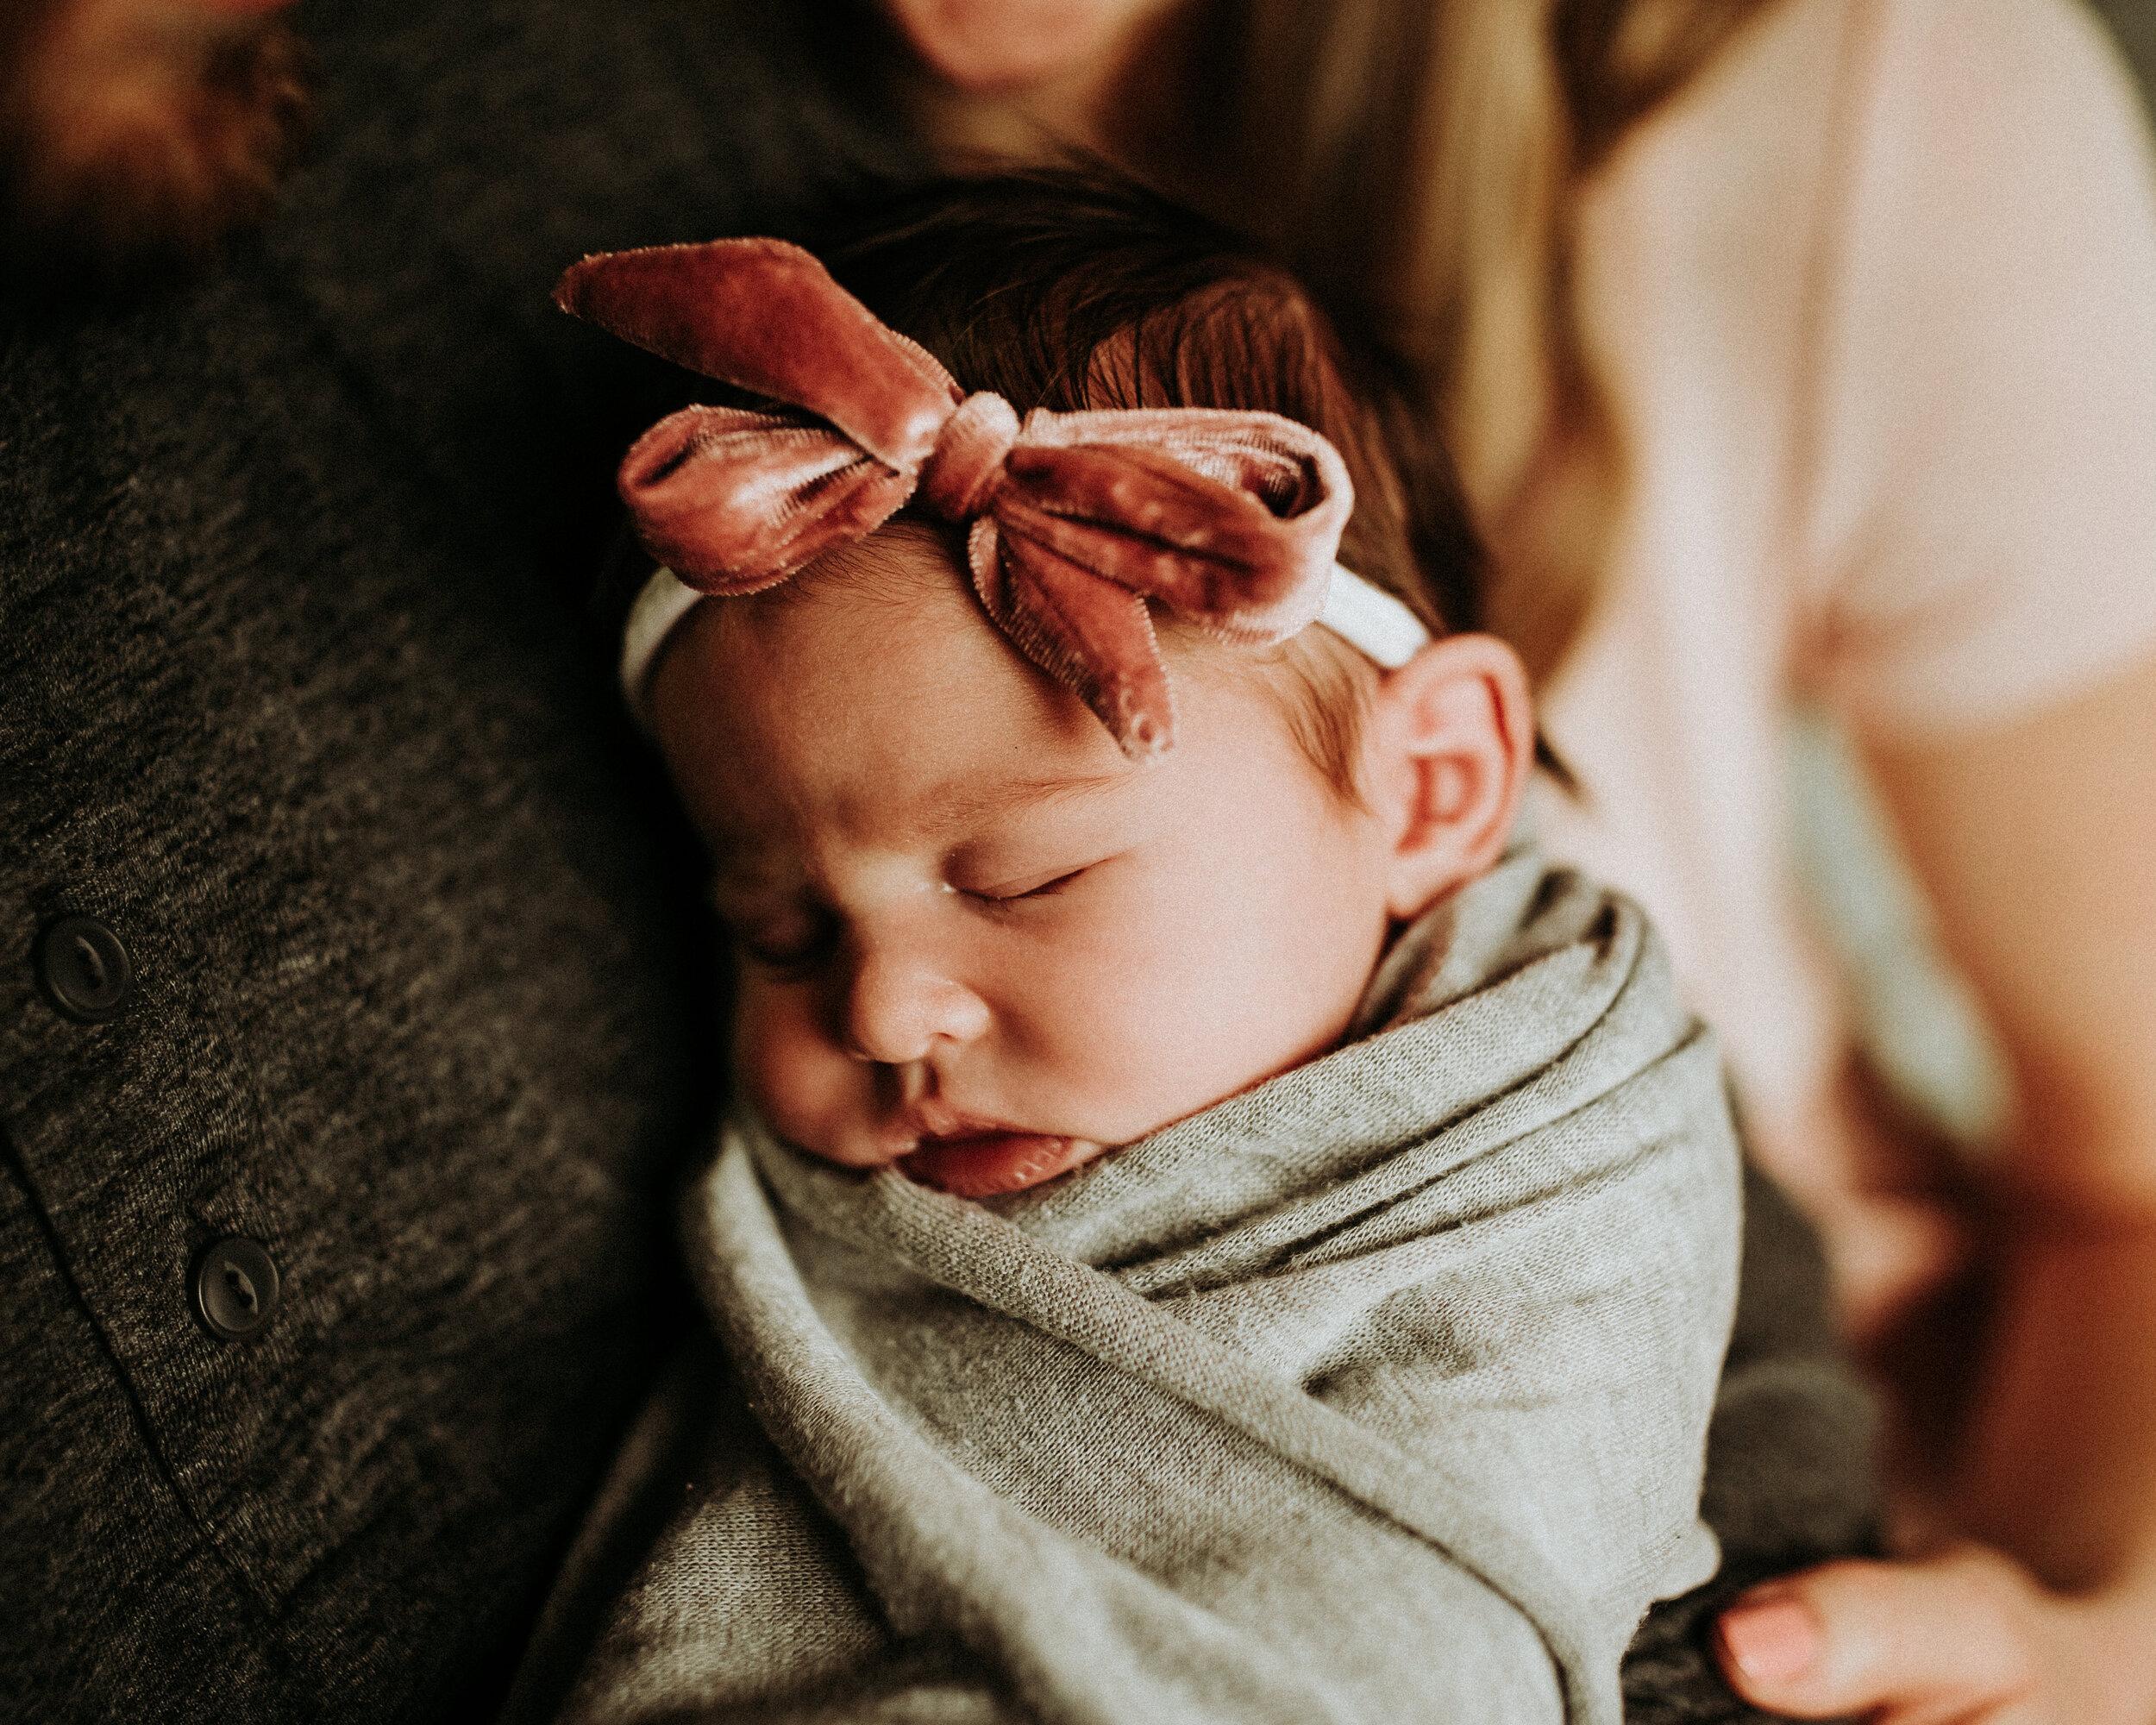 Newborn-Photographer-Bellingham-Wa-Brianne-Bell-Photography-(Dottie)-80.jpg